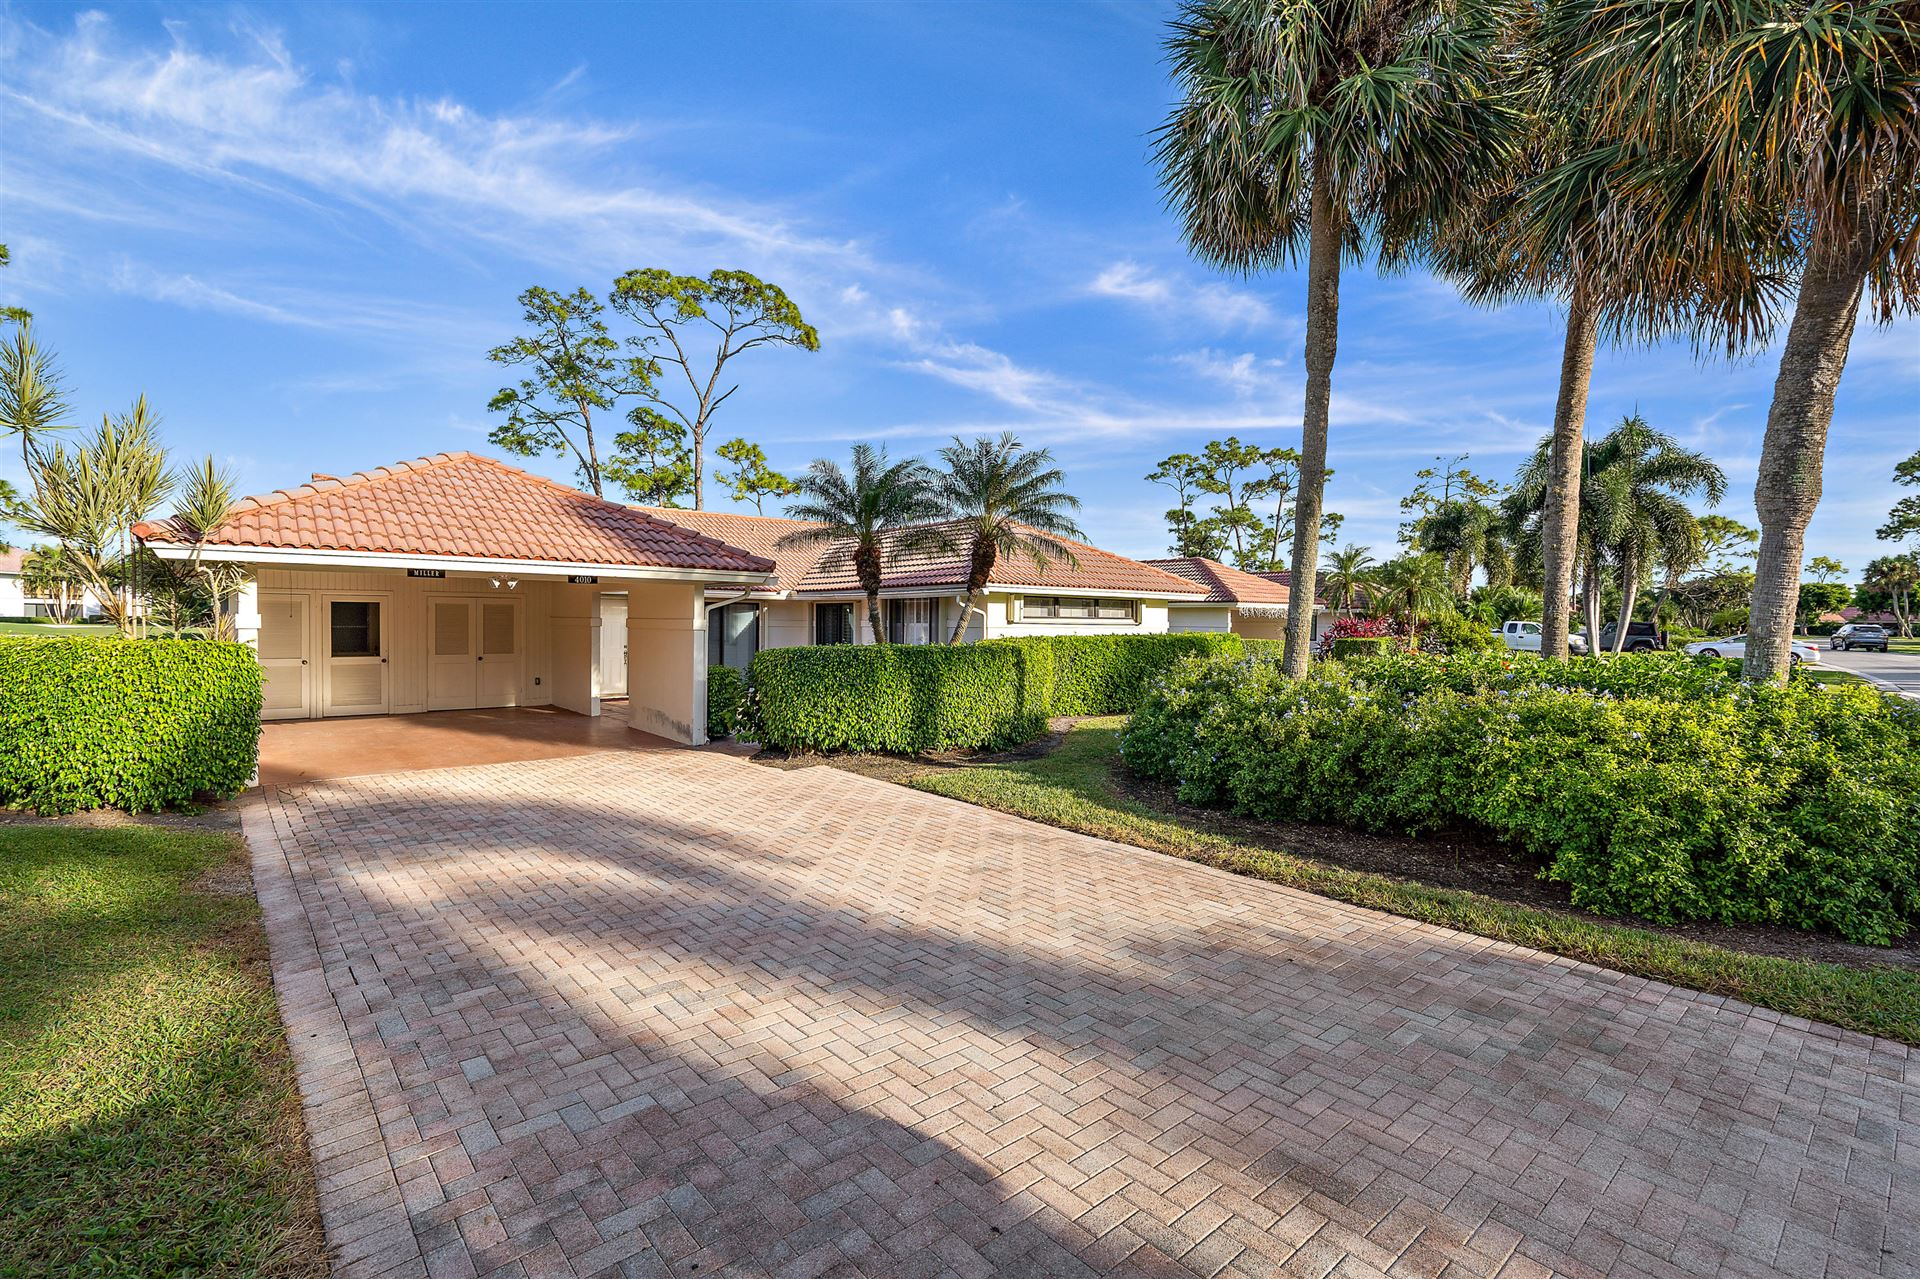 4010 Shelldrake Lane, Boynton Beach, FL 33436 - #: RX-10583728